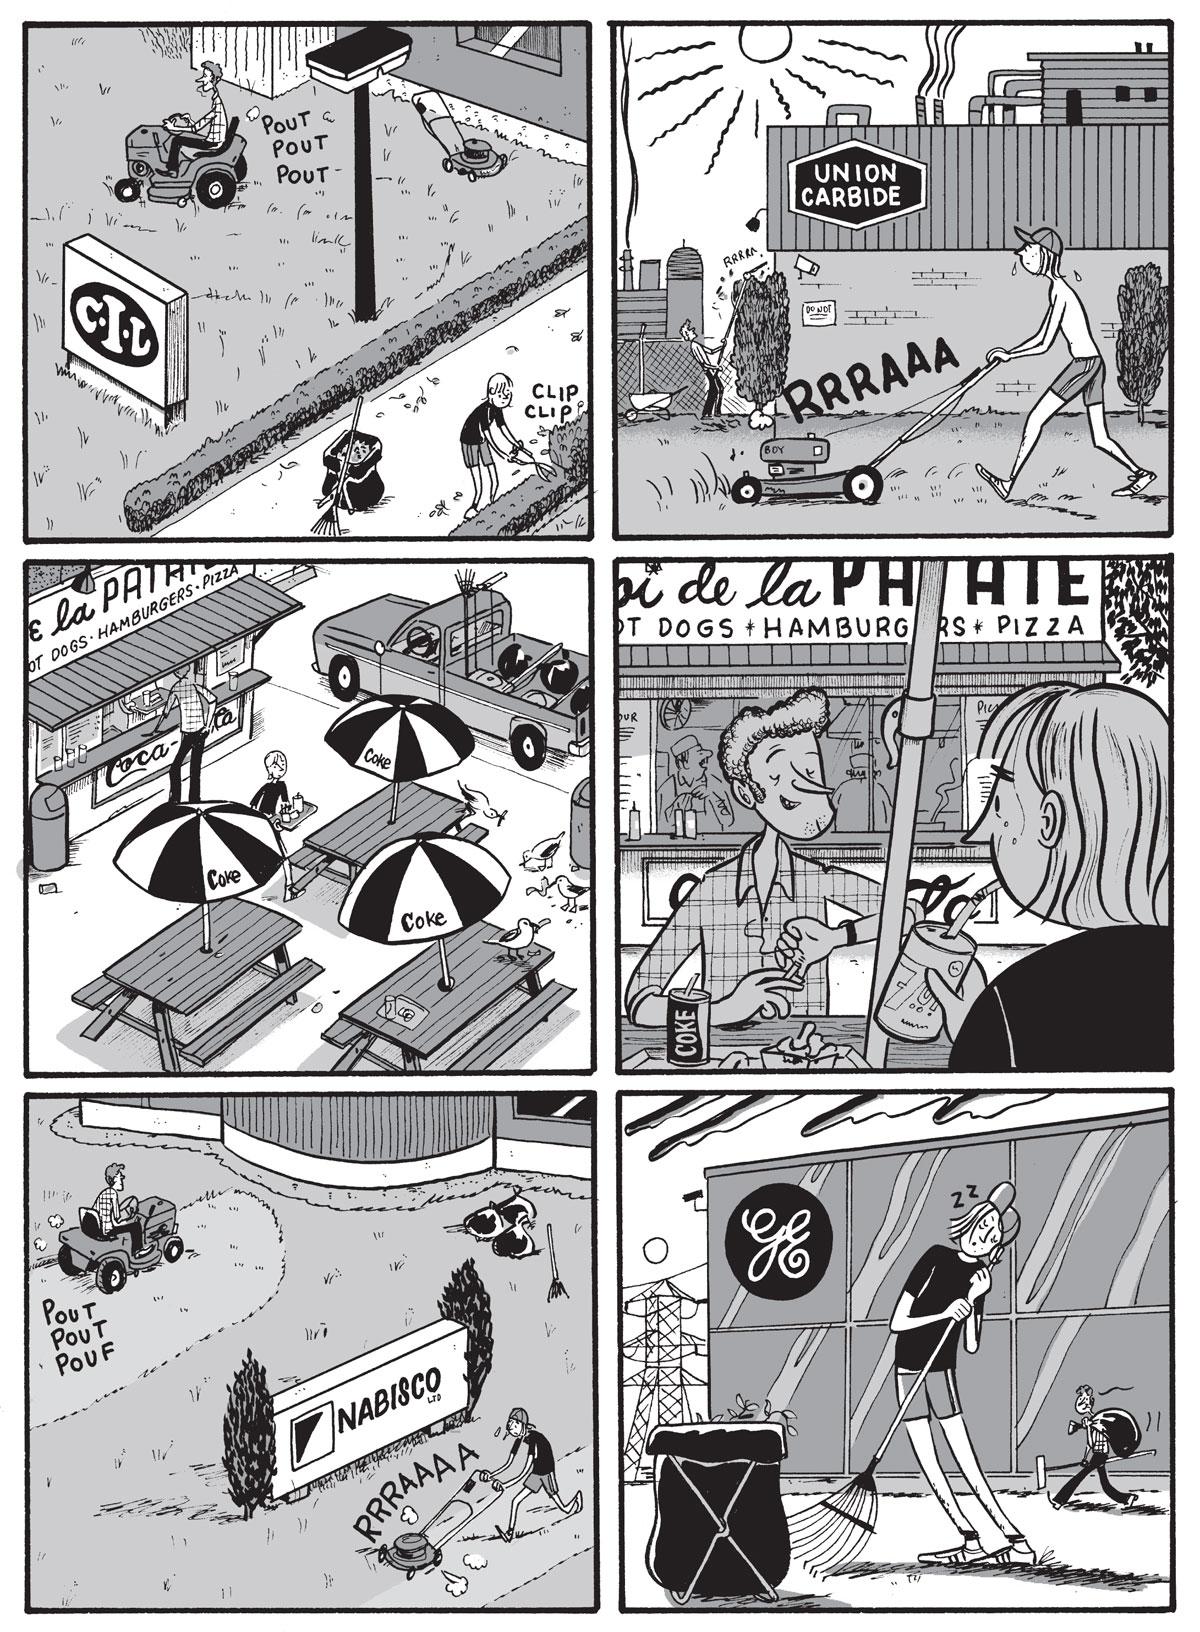 Illustration by Michel Rabagliati